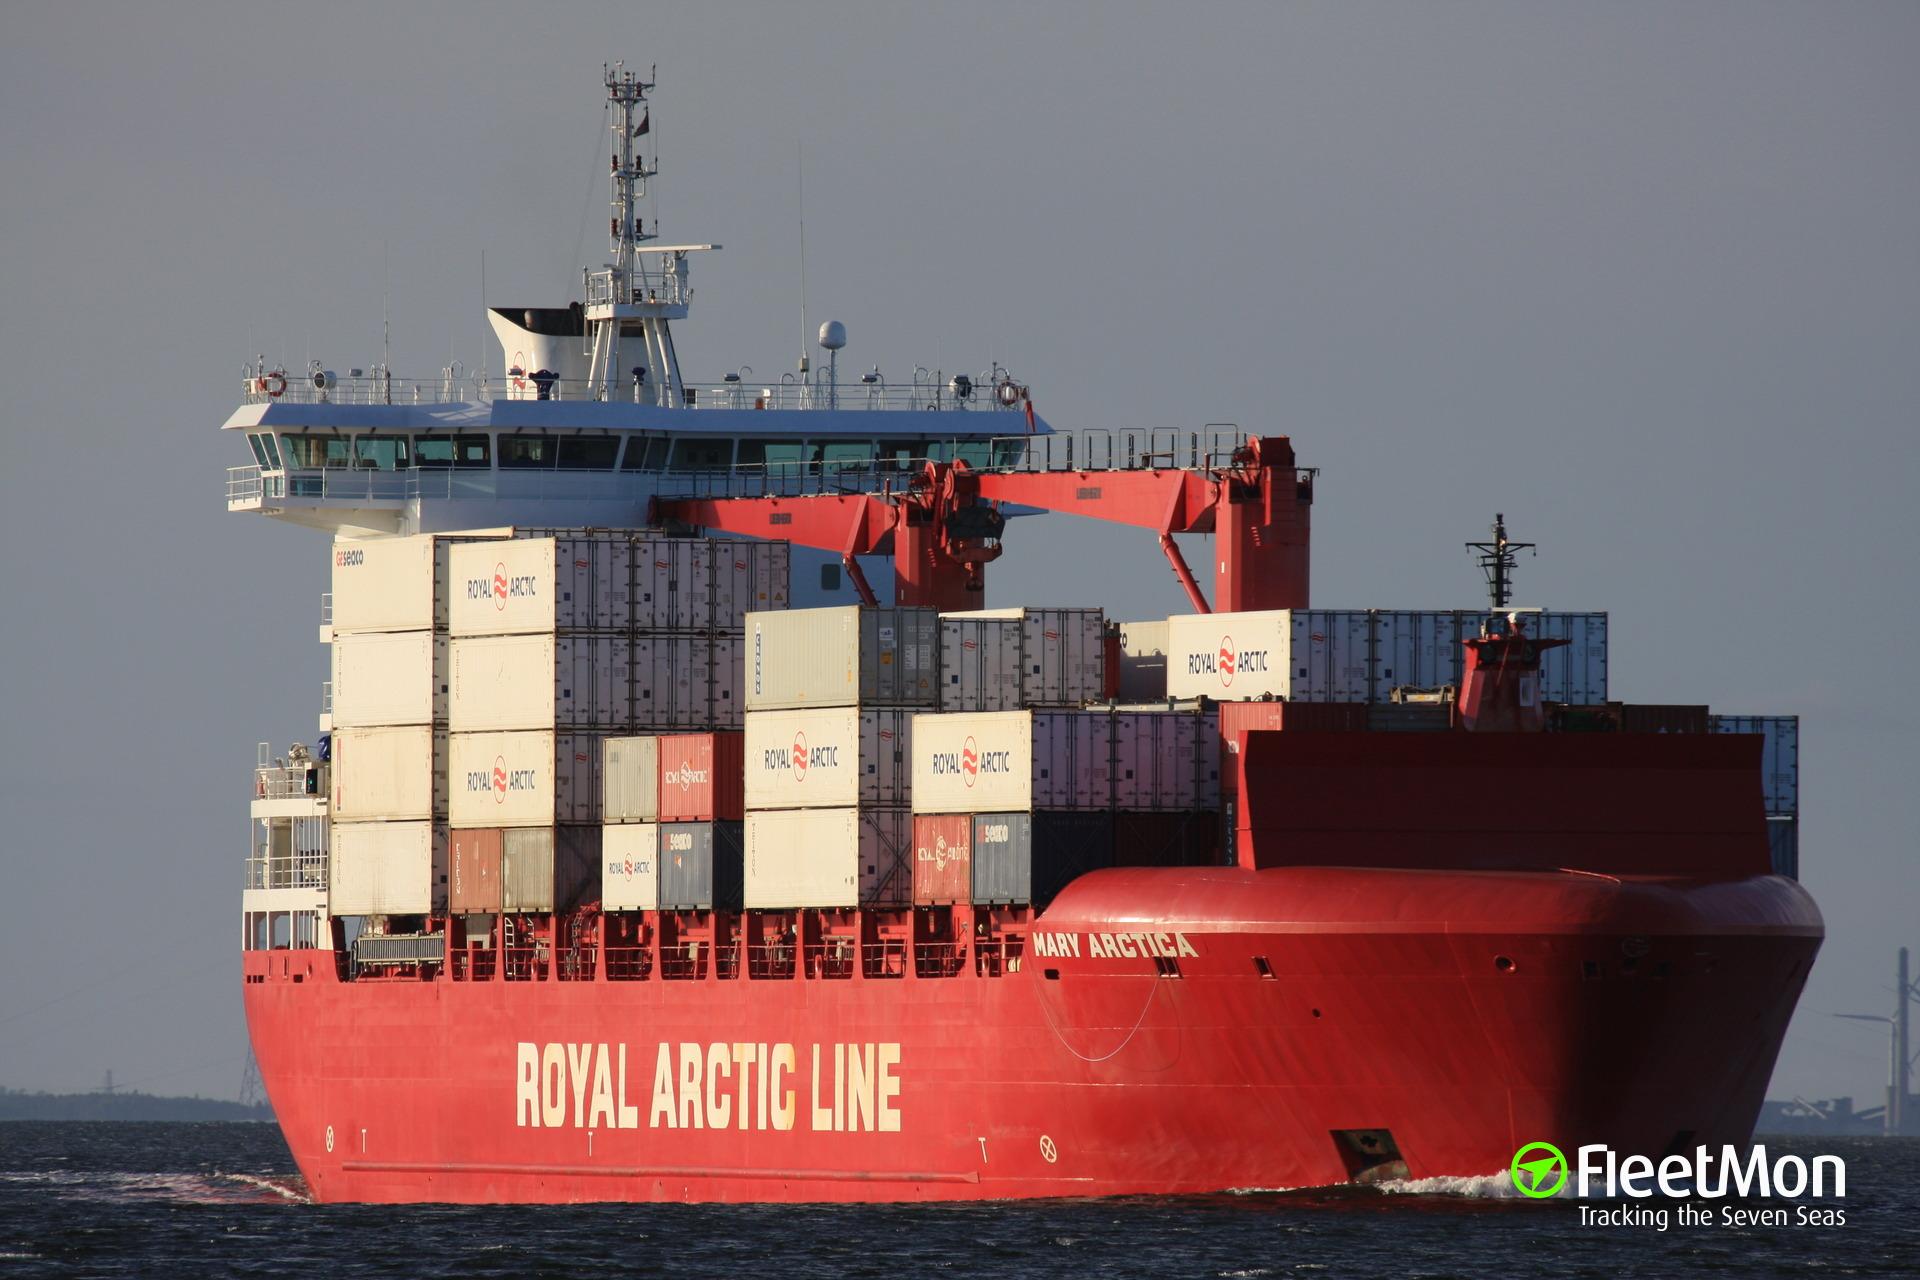 Royal Arctic Line's MARY ARCTICA hit iceberg, damaged